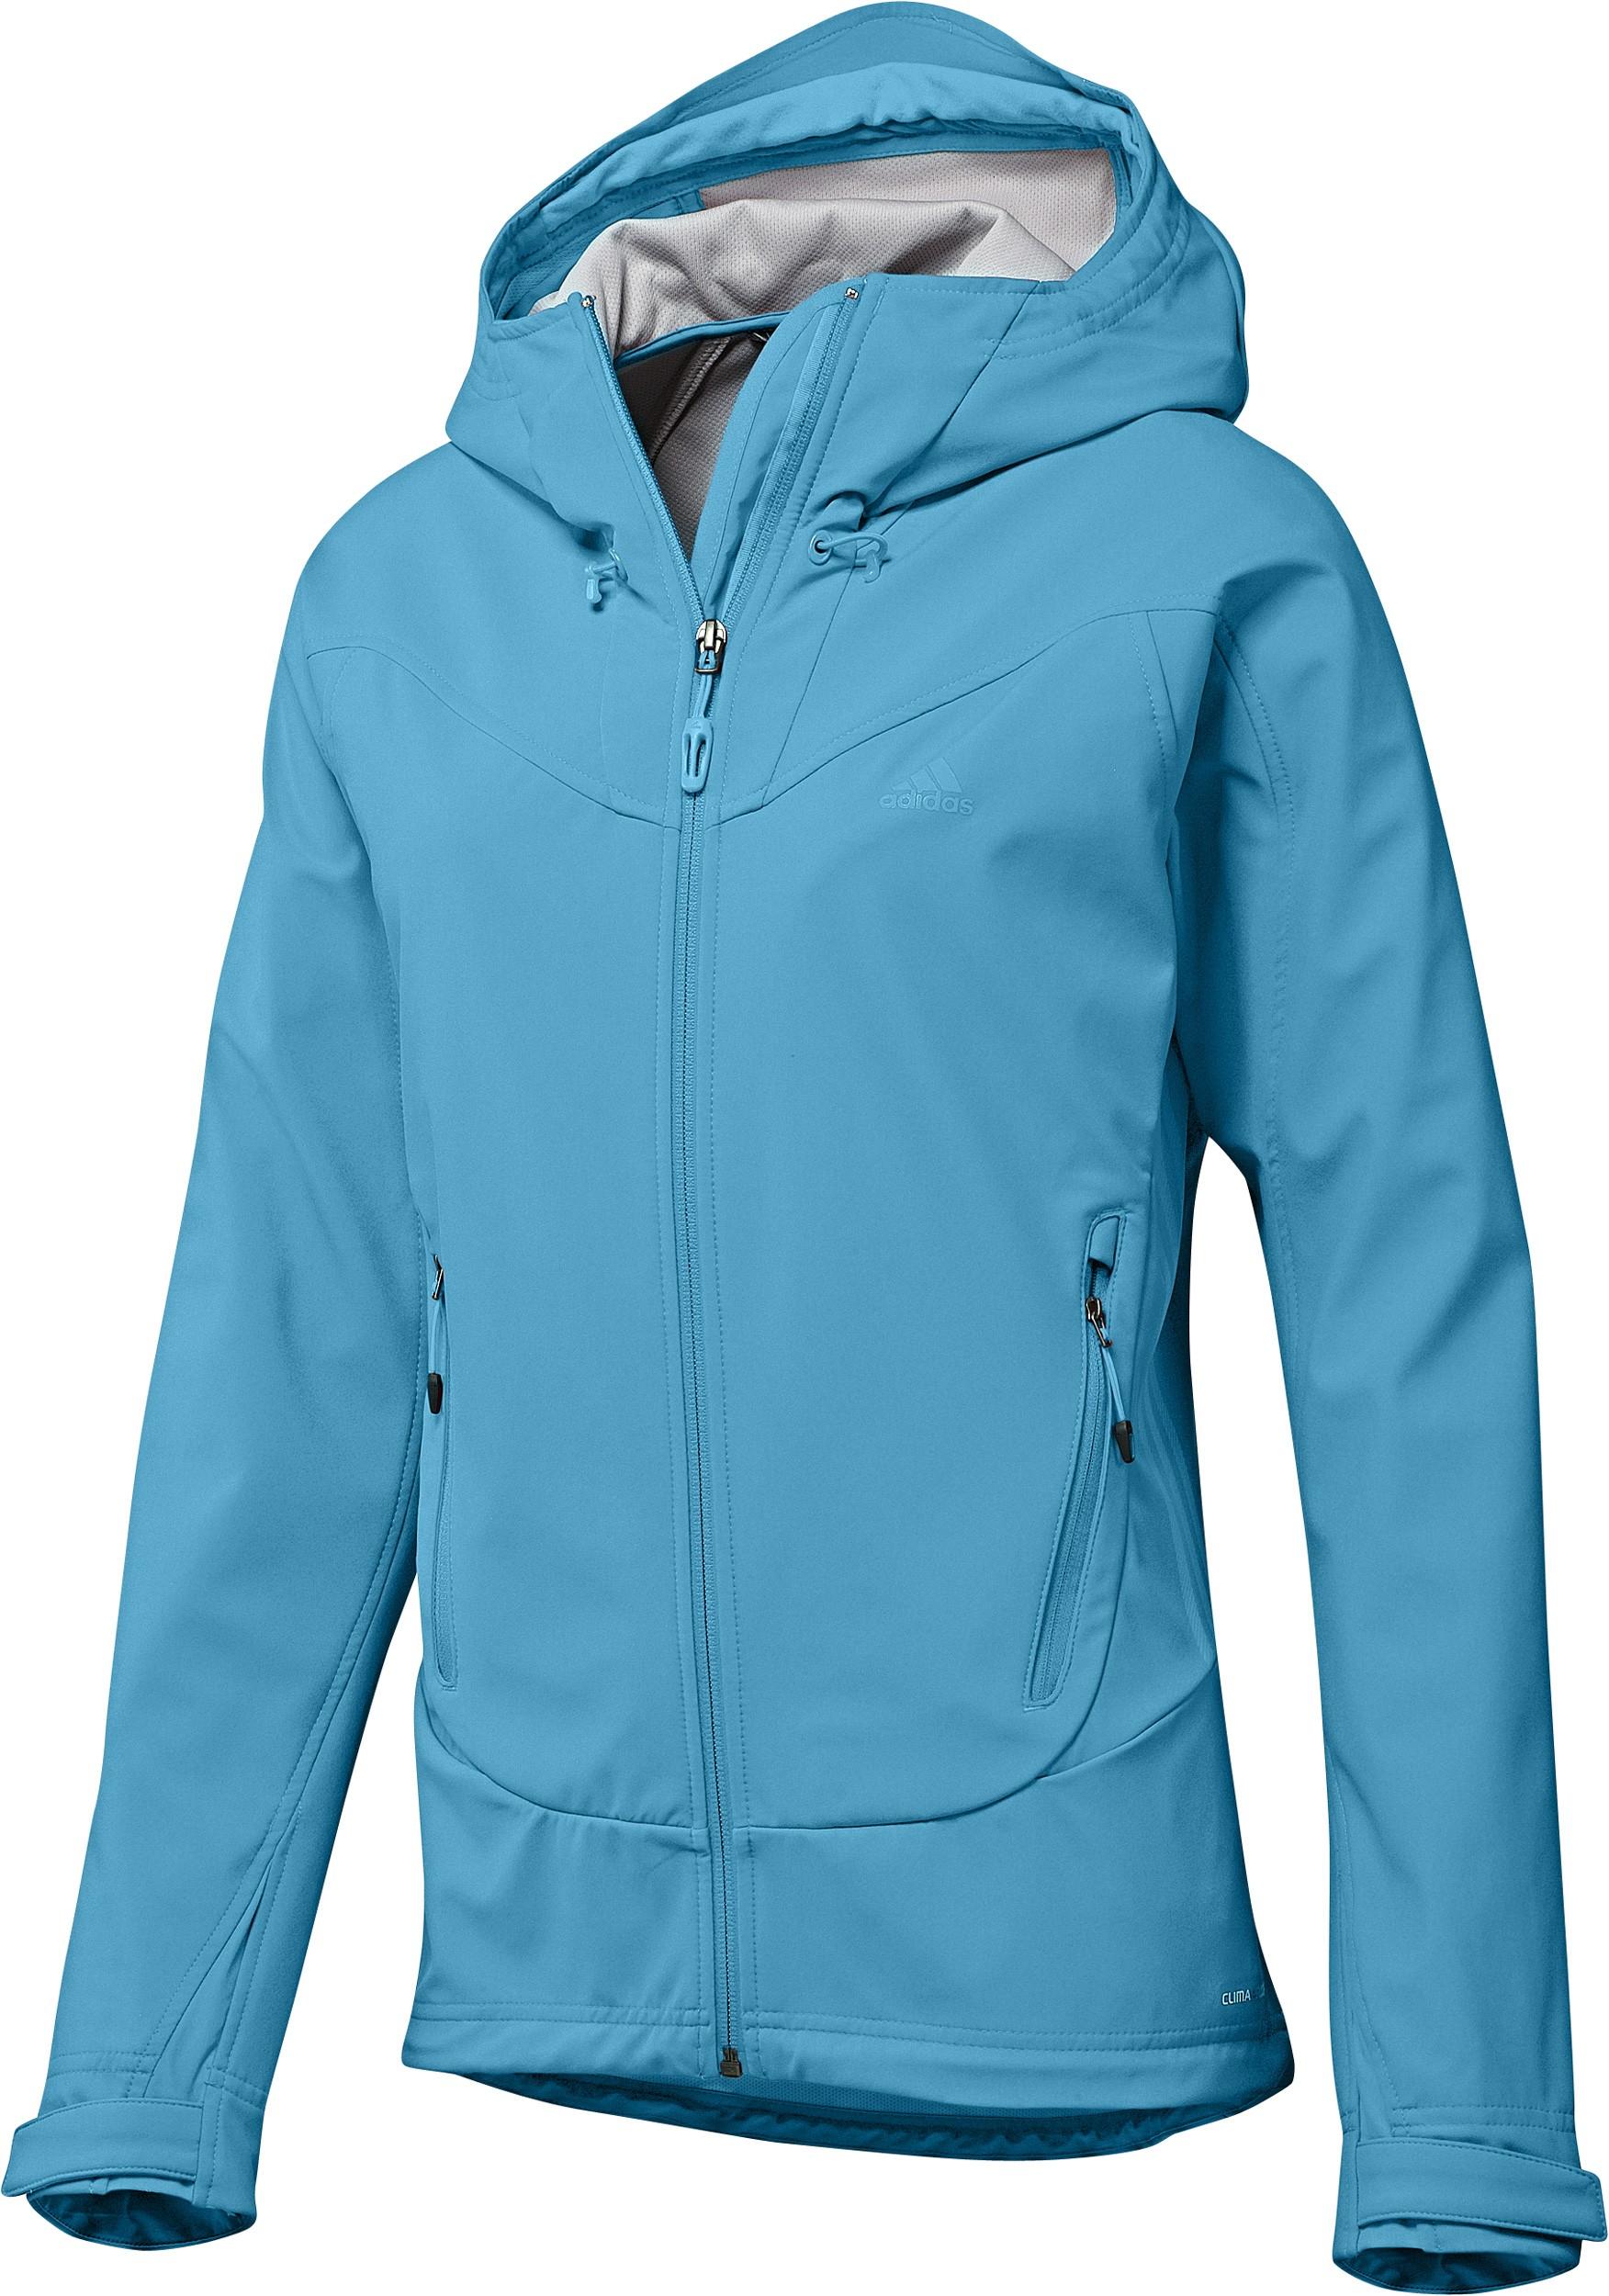 Adidas Terrex Swift Climaproof Softshell Jacket – Im